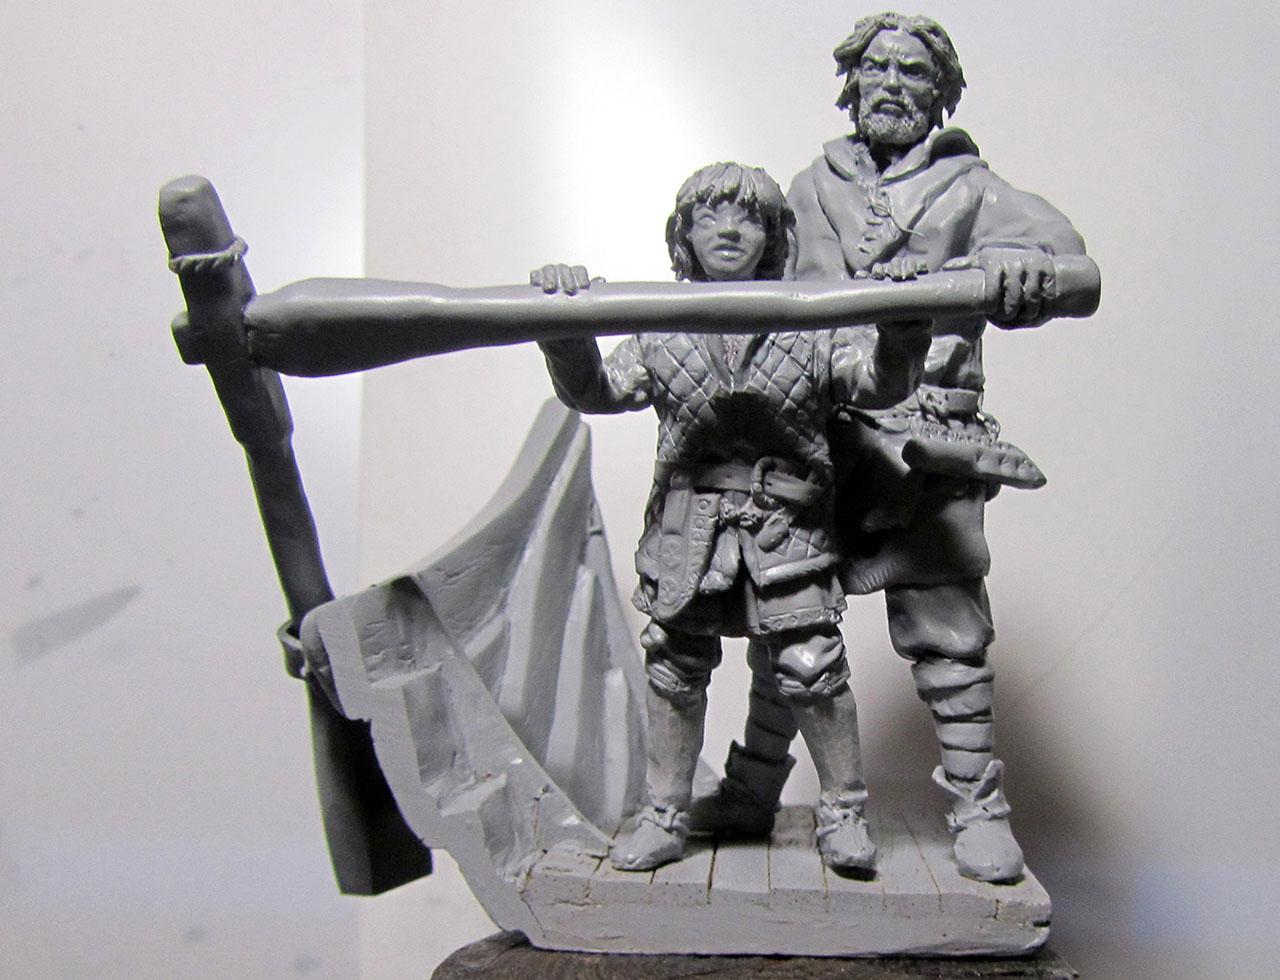 Sculpture: The Son, photo #2